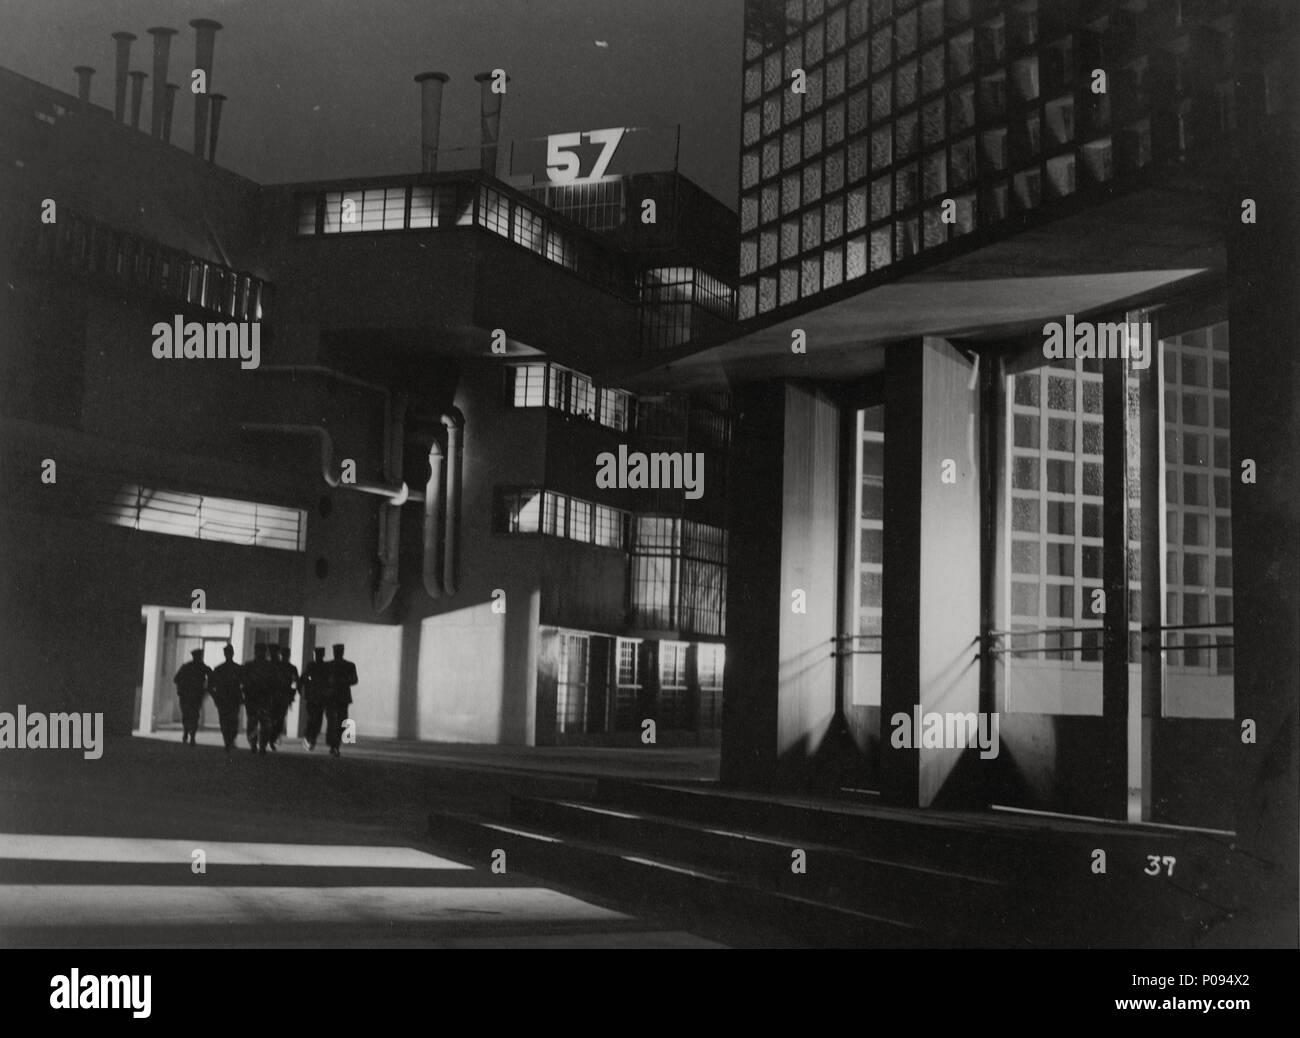 Original Film Title: A NOUS LA LIBERTE.  English Title: LIBERTY FOR US.  Film Director: RENE CLAIR.  Year: 1931. Credit: TOBIS FILM / Album Stock Photo